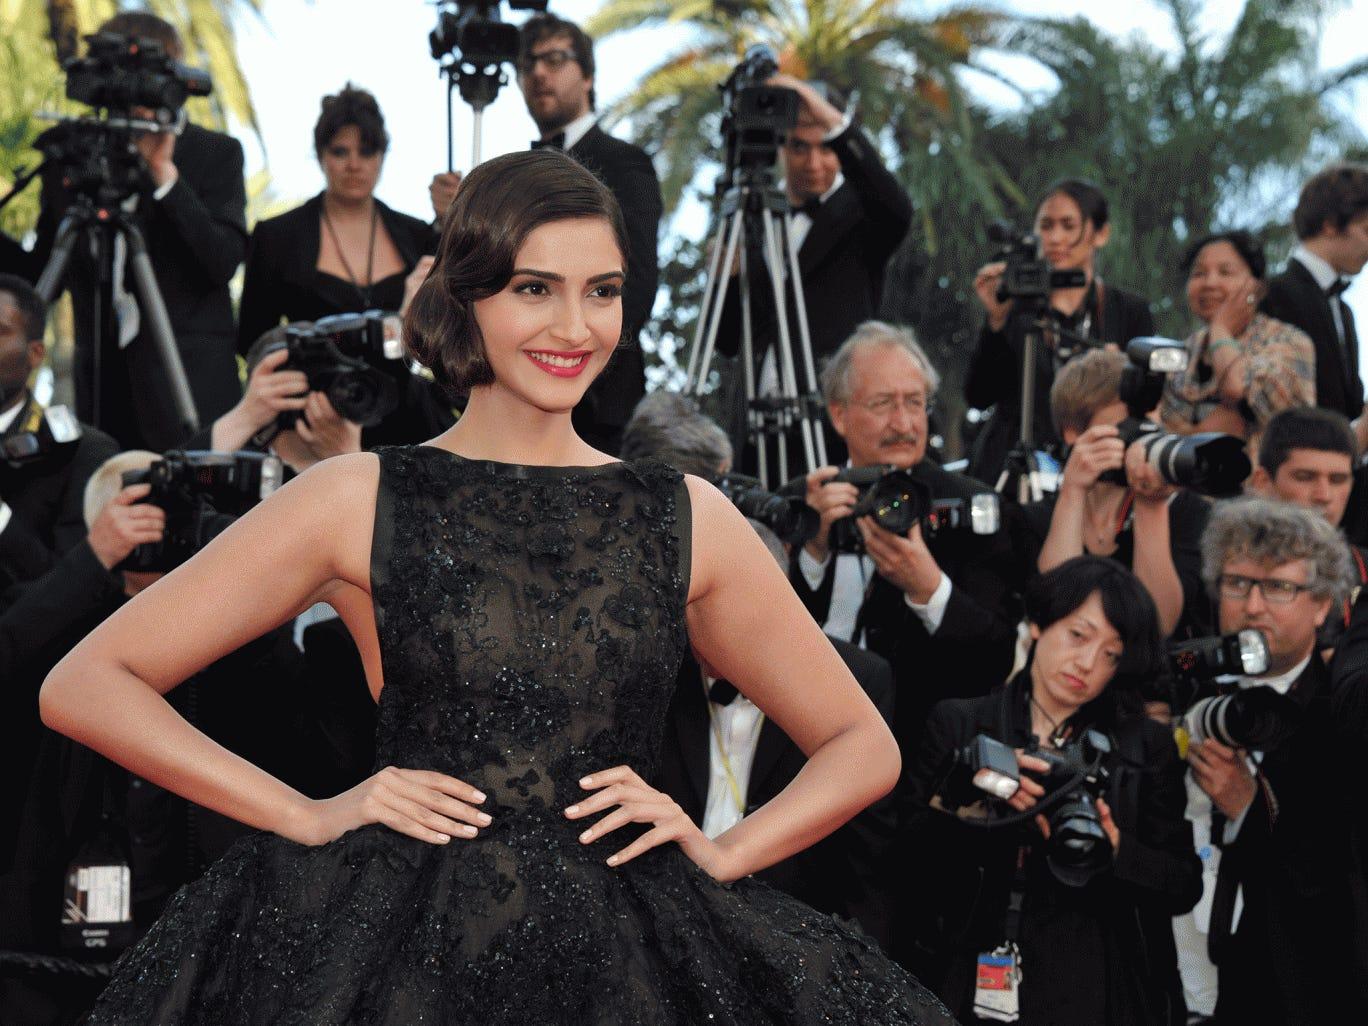 Sonam Kapoor attends the Cannes Film Festival 2014